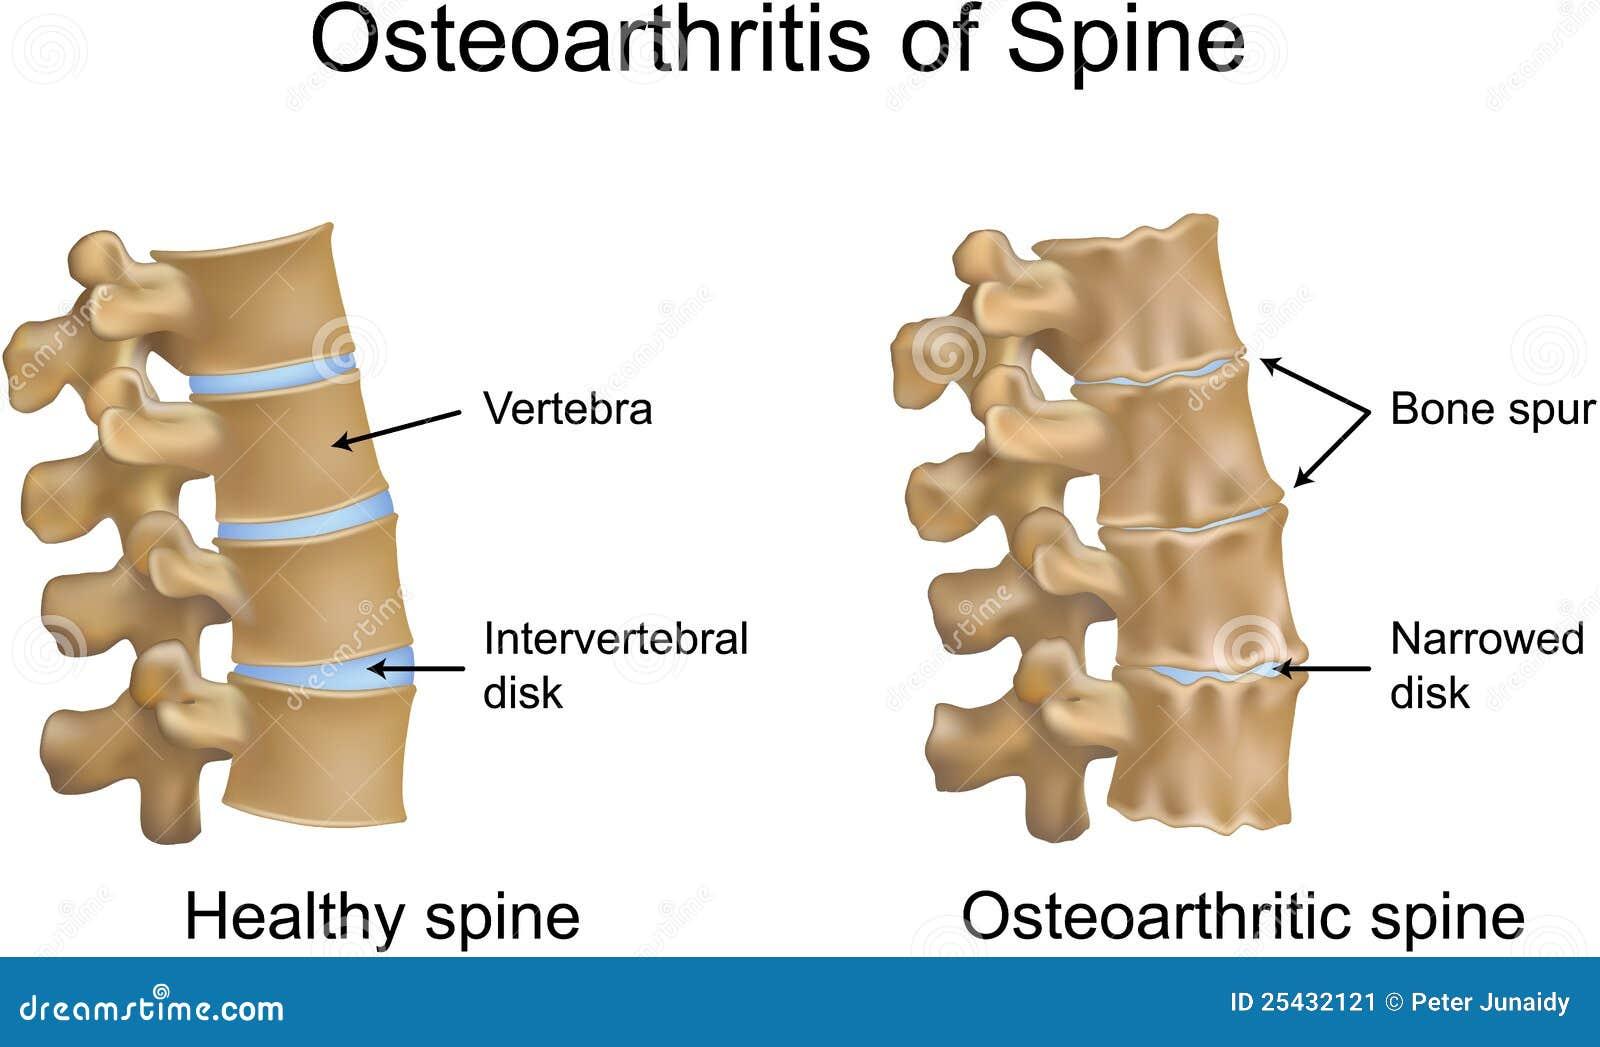 Osteo arthritis images க்கான பட முடிவு